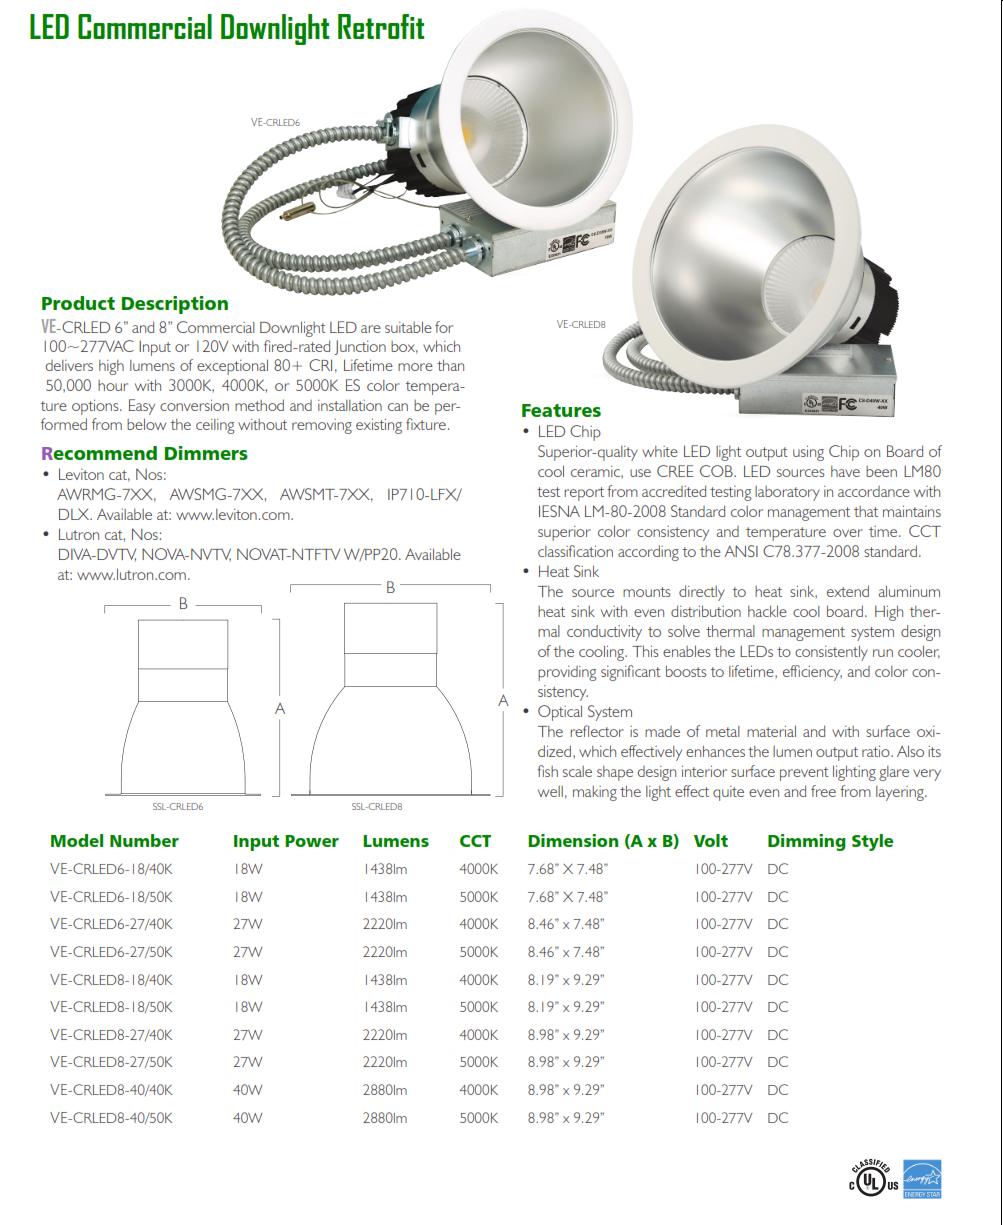 Led Commercial Downlight Retrofit Open Trim Lighting